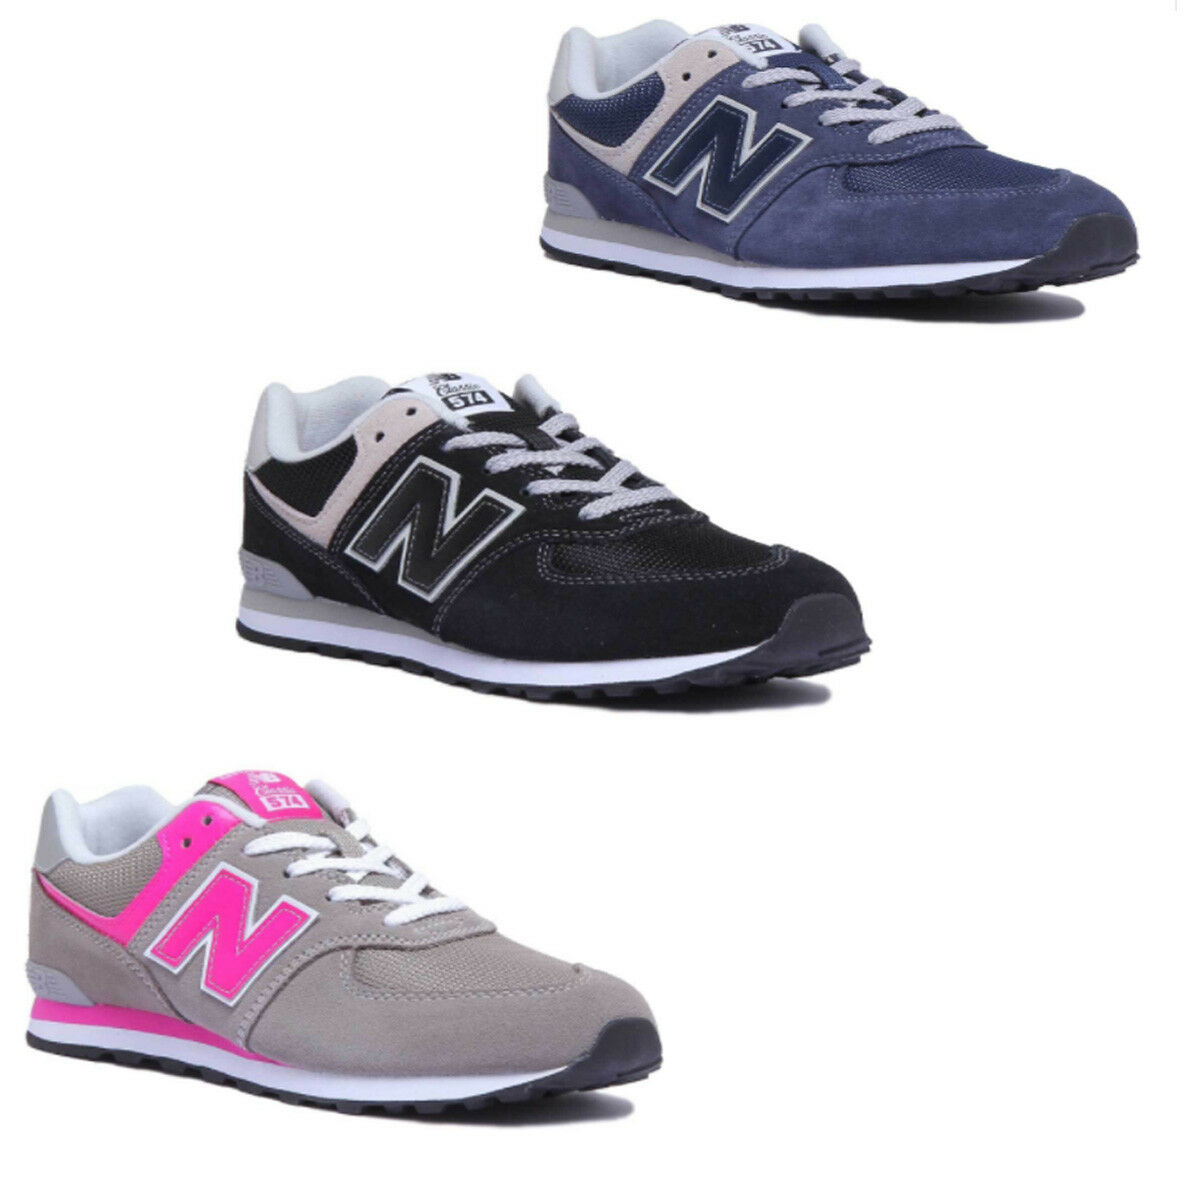 NEW Nero Balance GC574GK varie Gioventù Nero NEW Bianco Scarpe Da Ginnastica a563c2